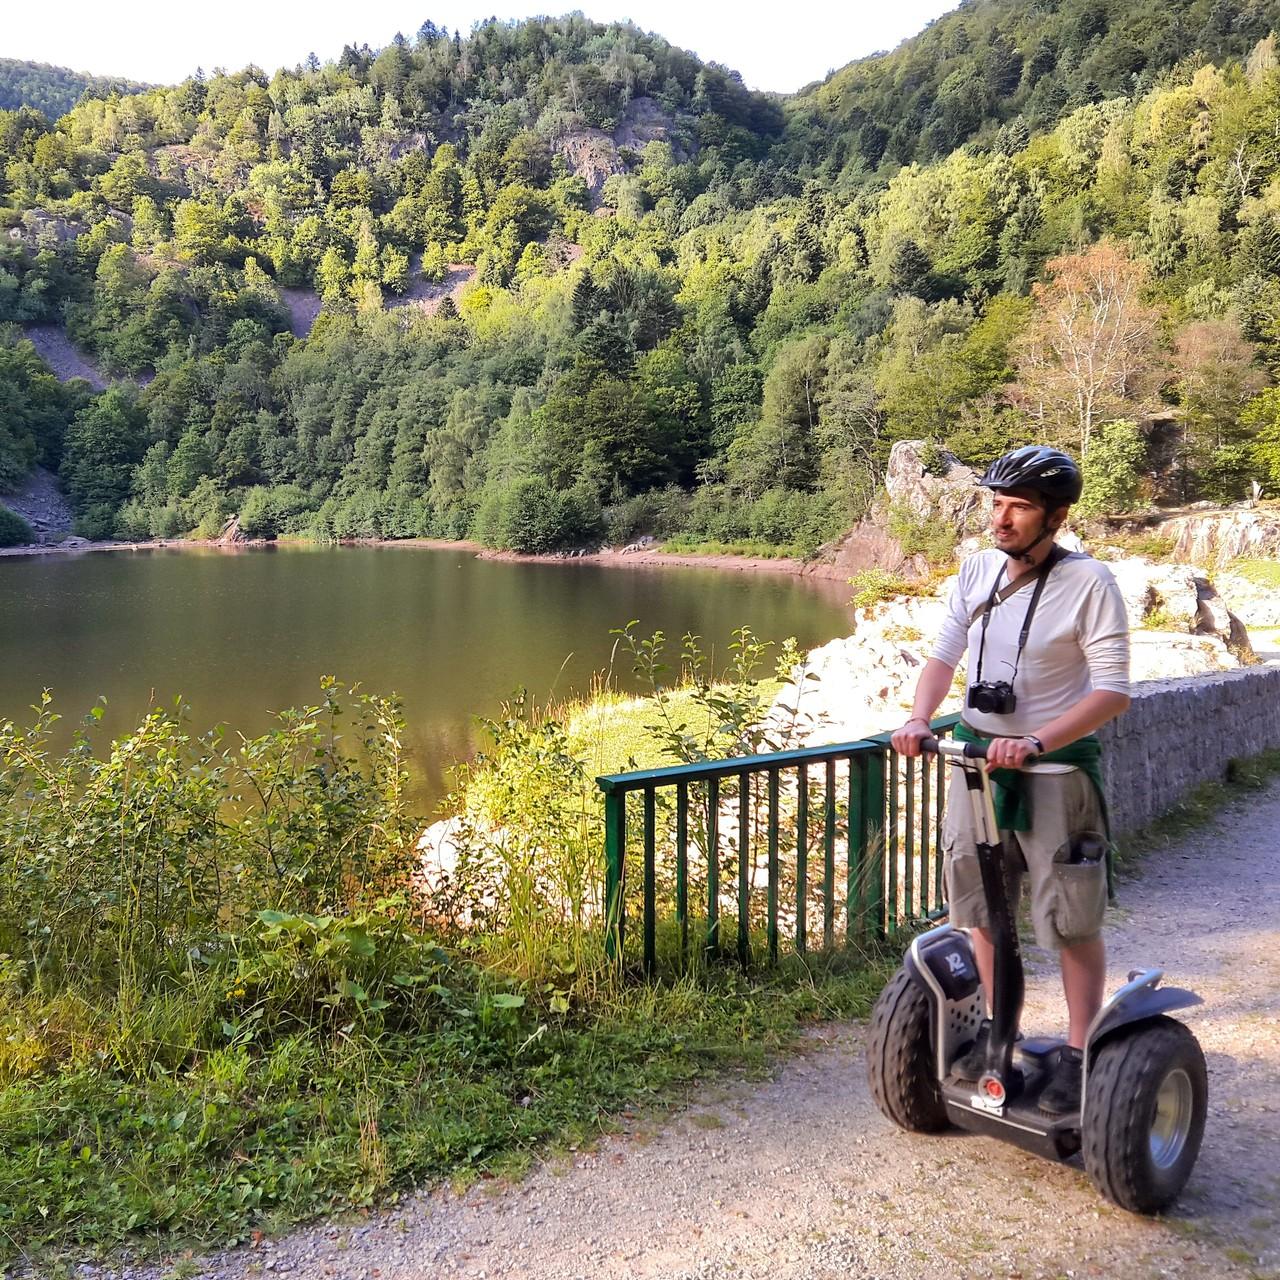 FUN MOVING GYROPODE SEGWAY EN ALSACE- Lac GrandNeuweiher, Vosges